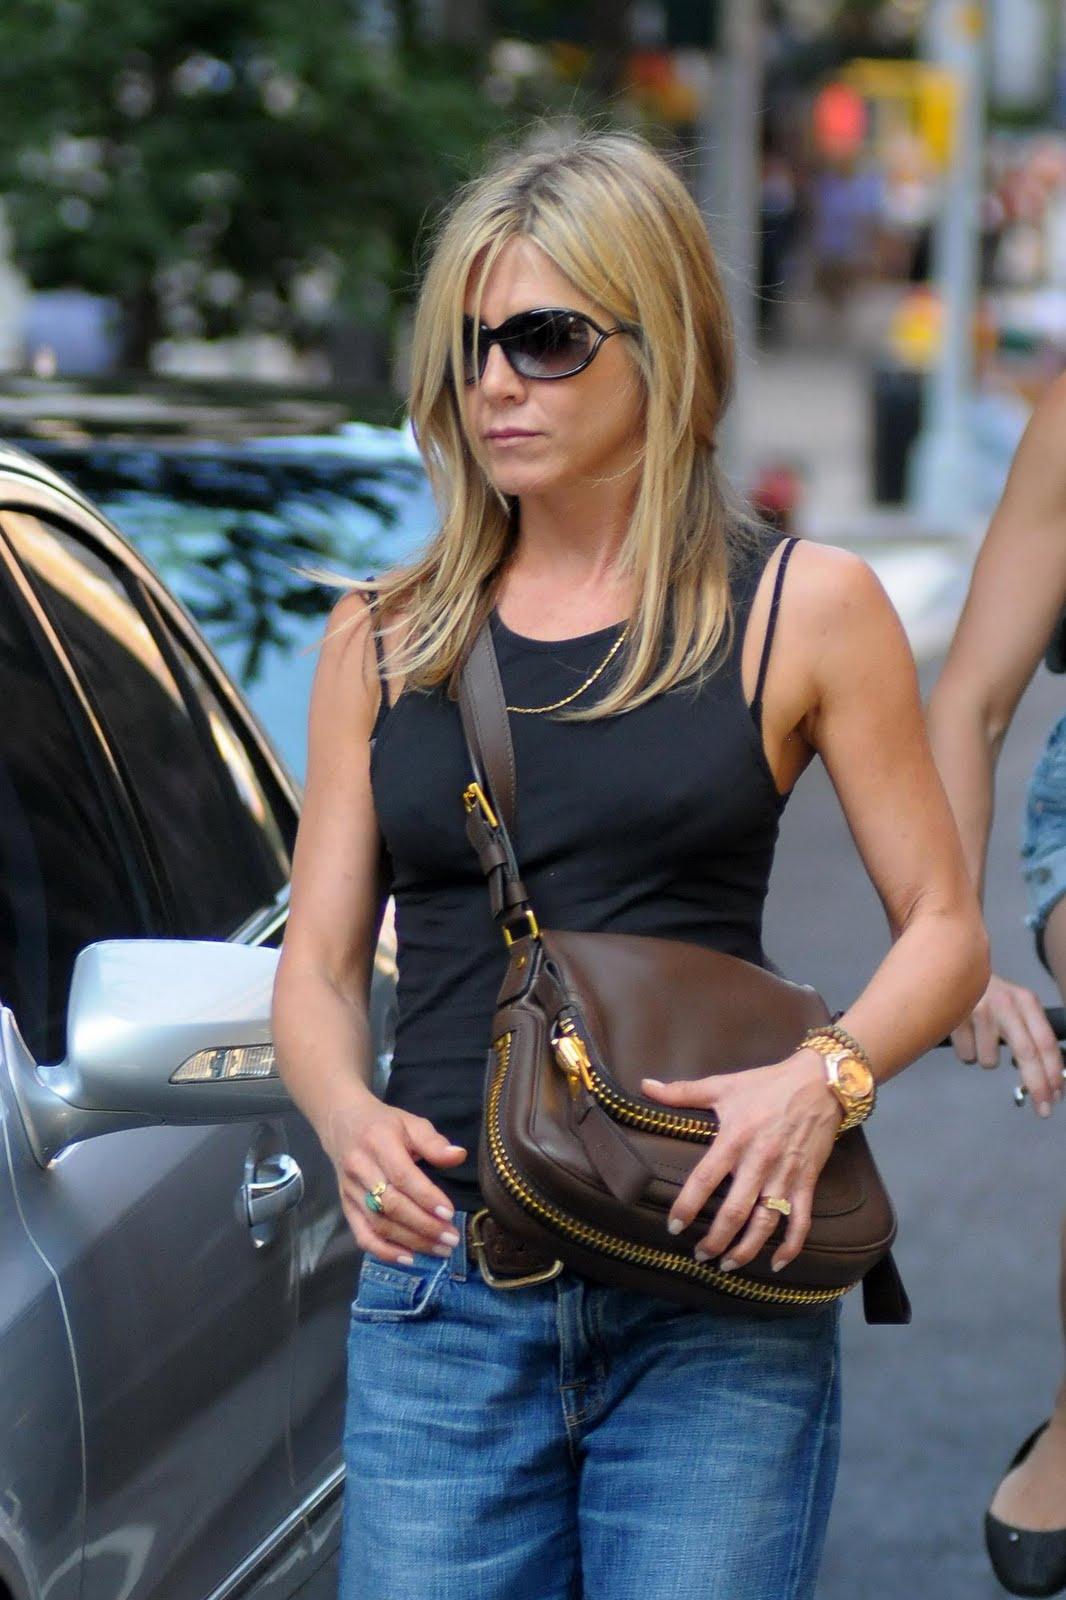 Jennifer Aniston Pokies Candids from NYC. | Perfect fucking strangers